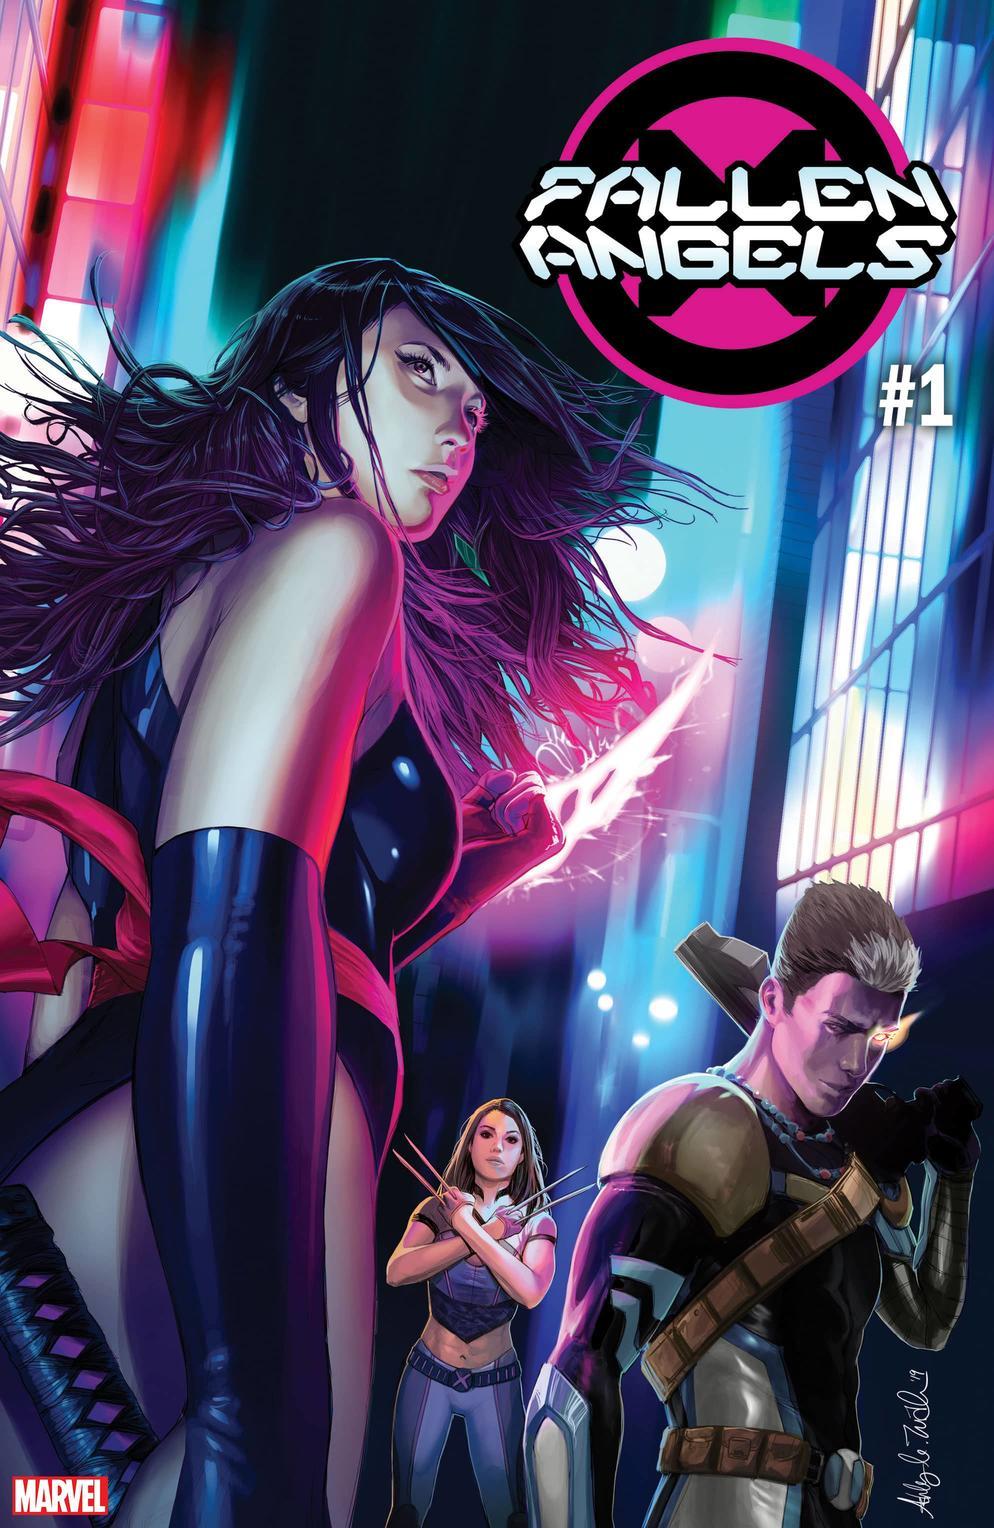 Marvel Comics na SDCC 2019 - X-Men - Fallen Angels #1 - Anjos Caídos - Blog Farofeiros